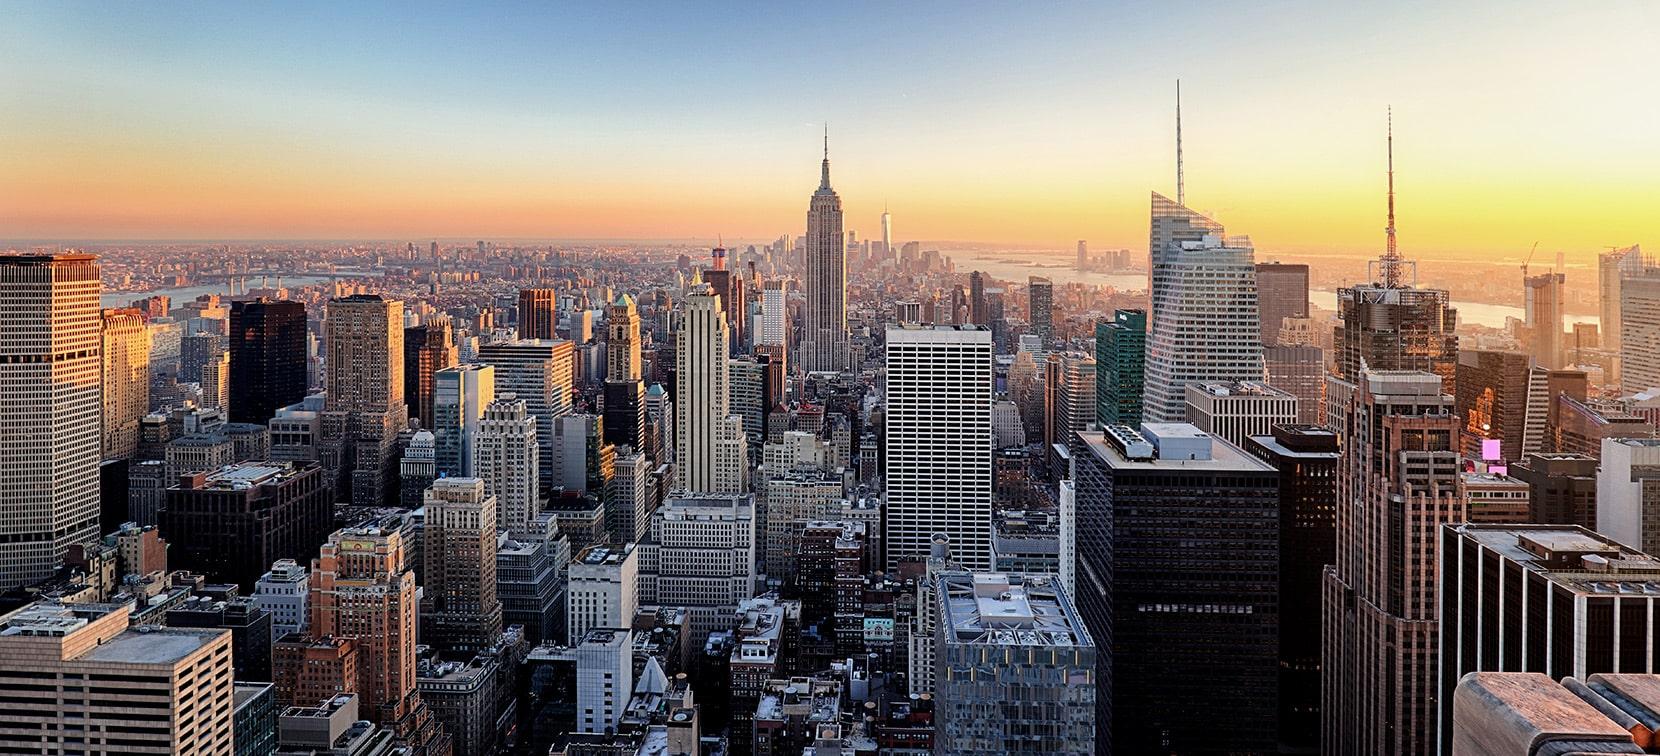 News - Commercial Construction Company New York City